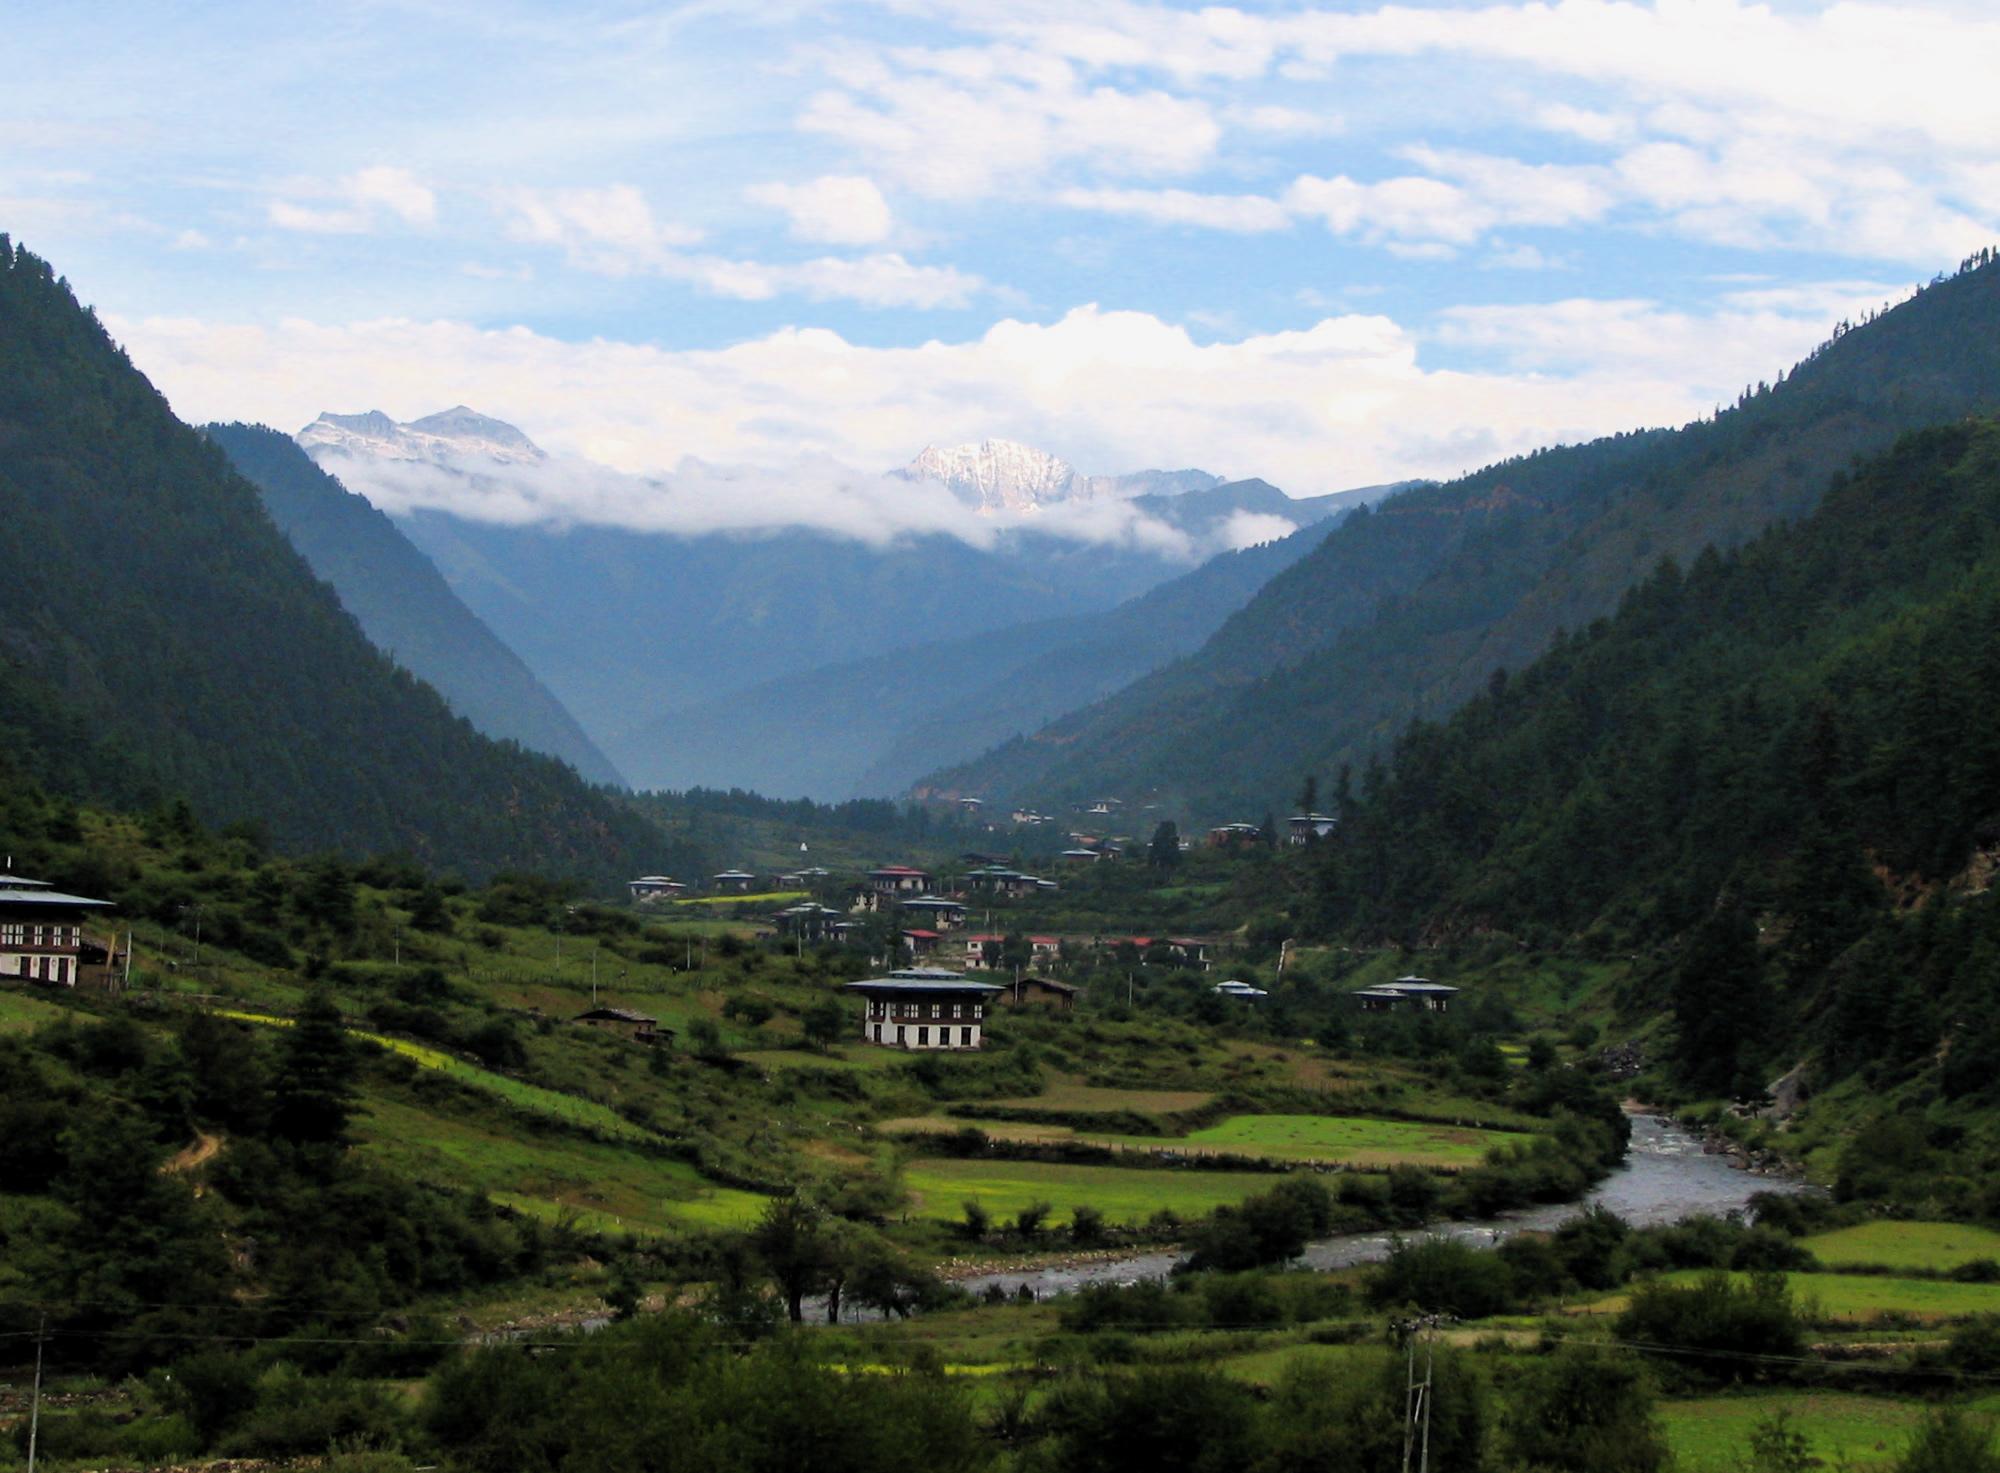 trip to valley valleys travel planner app